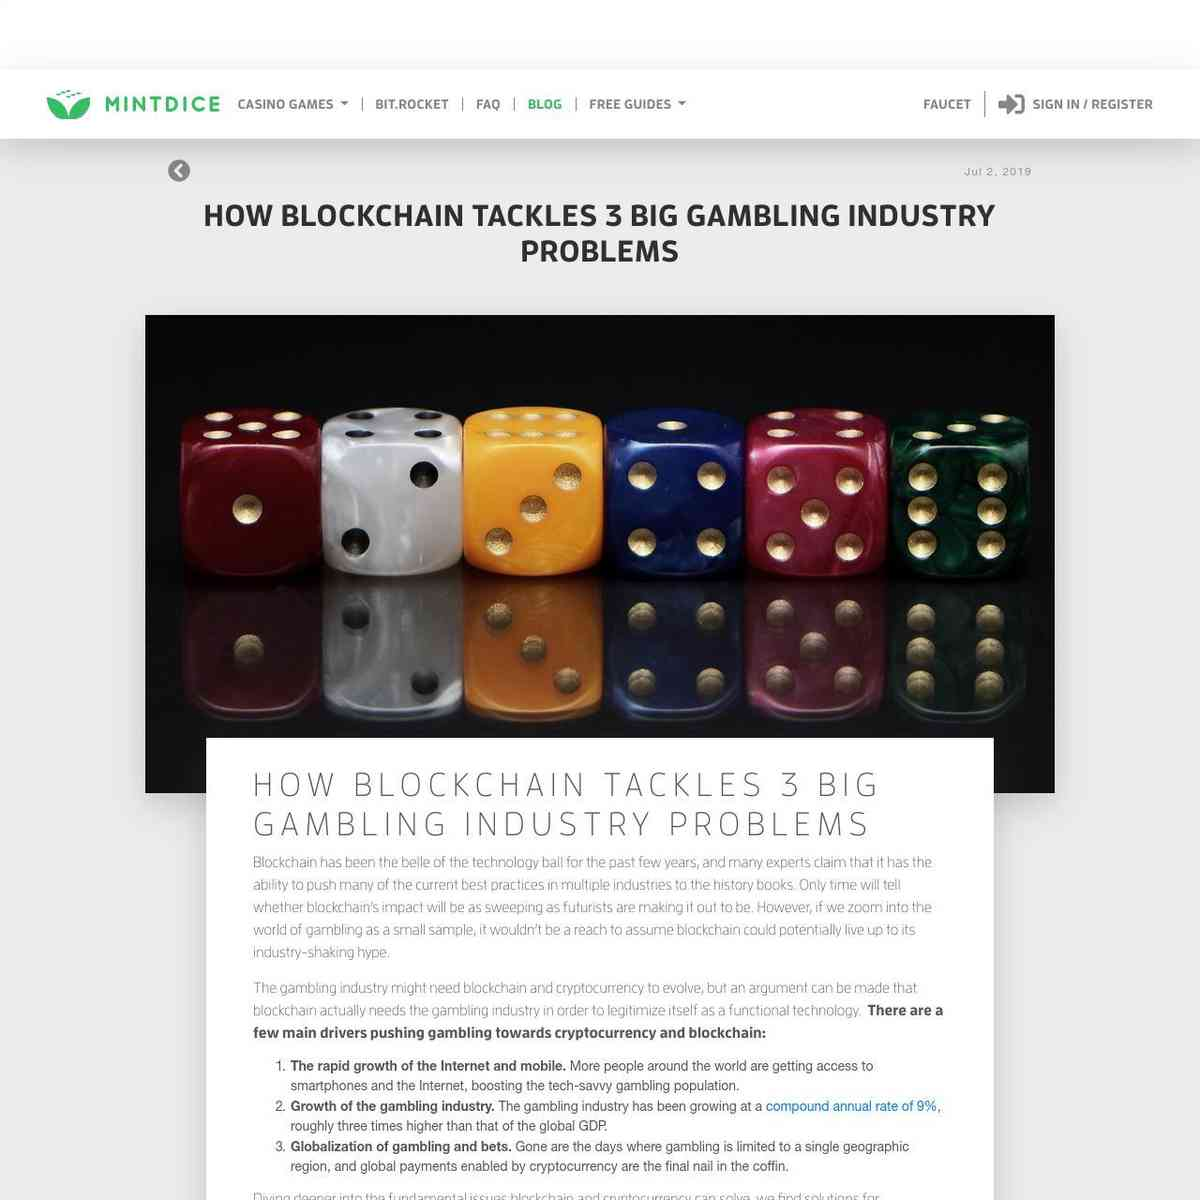 How Blockchain Tackles 3 Big Gambling Industry Problems